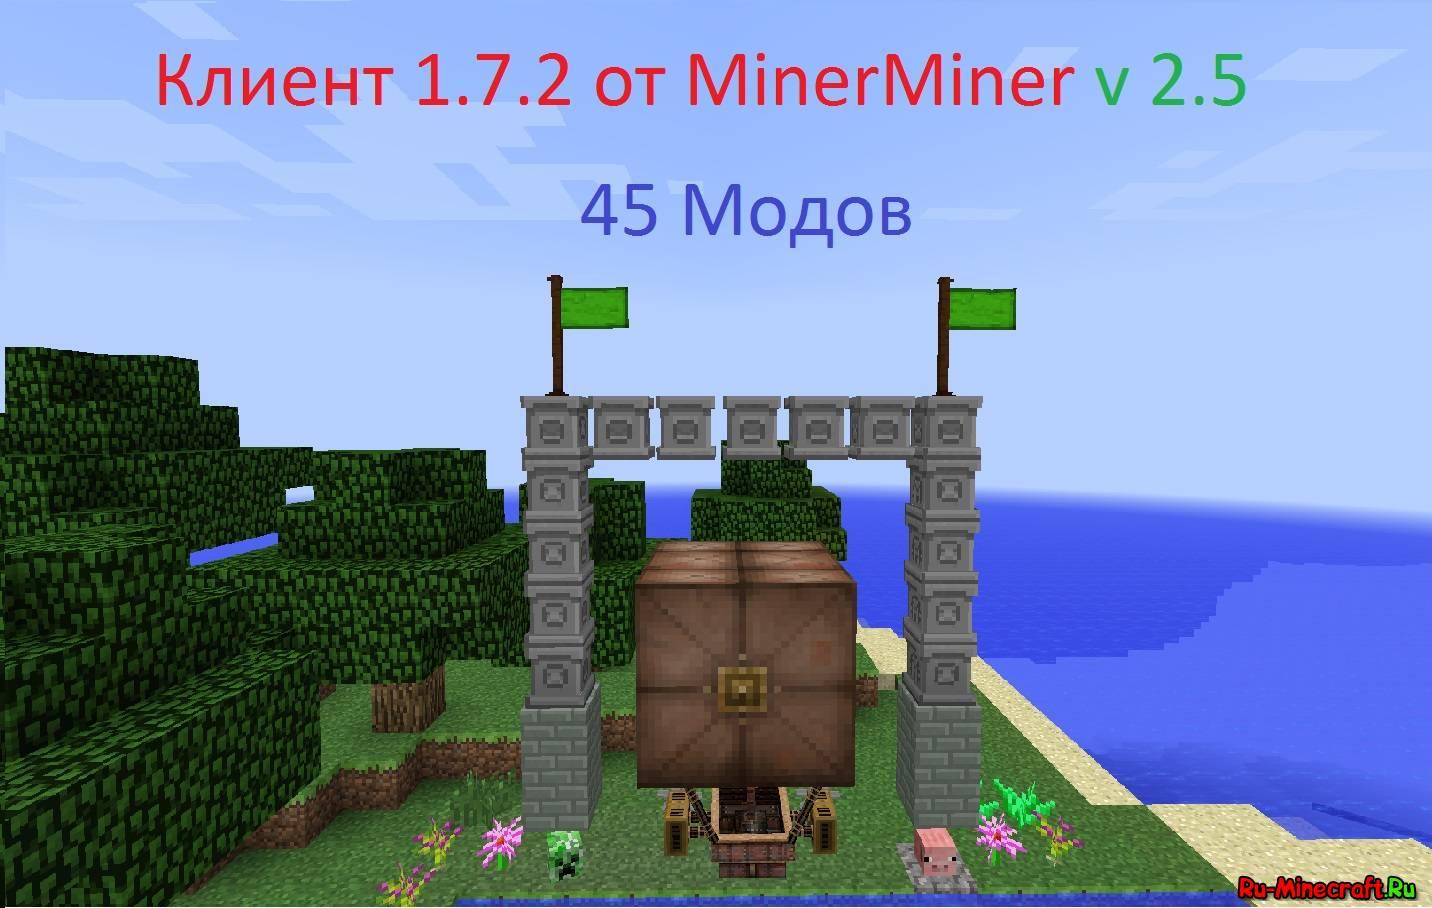 Сервера Майнкрафт 1.7.2 с модами — 1 сервер